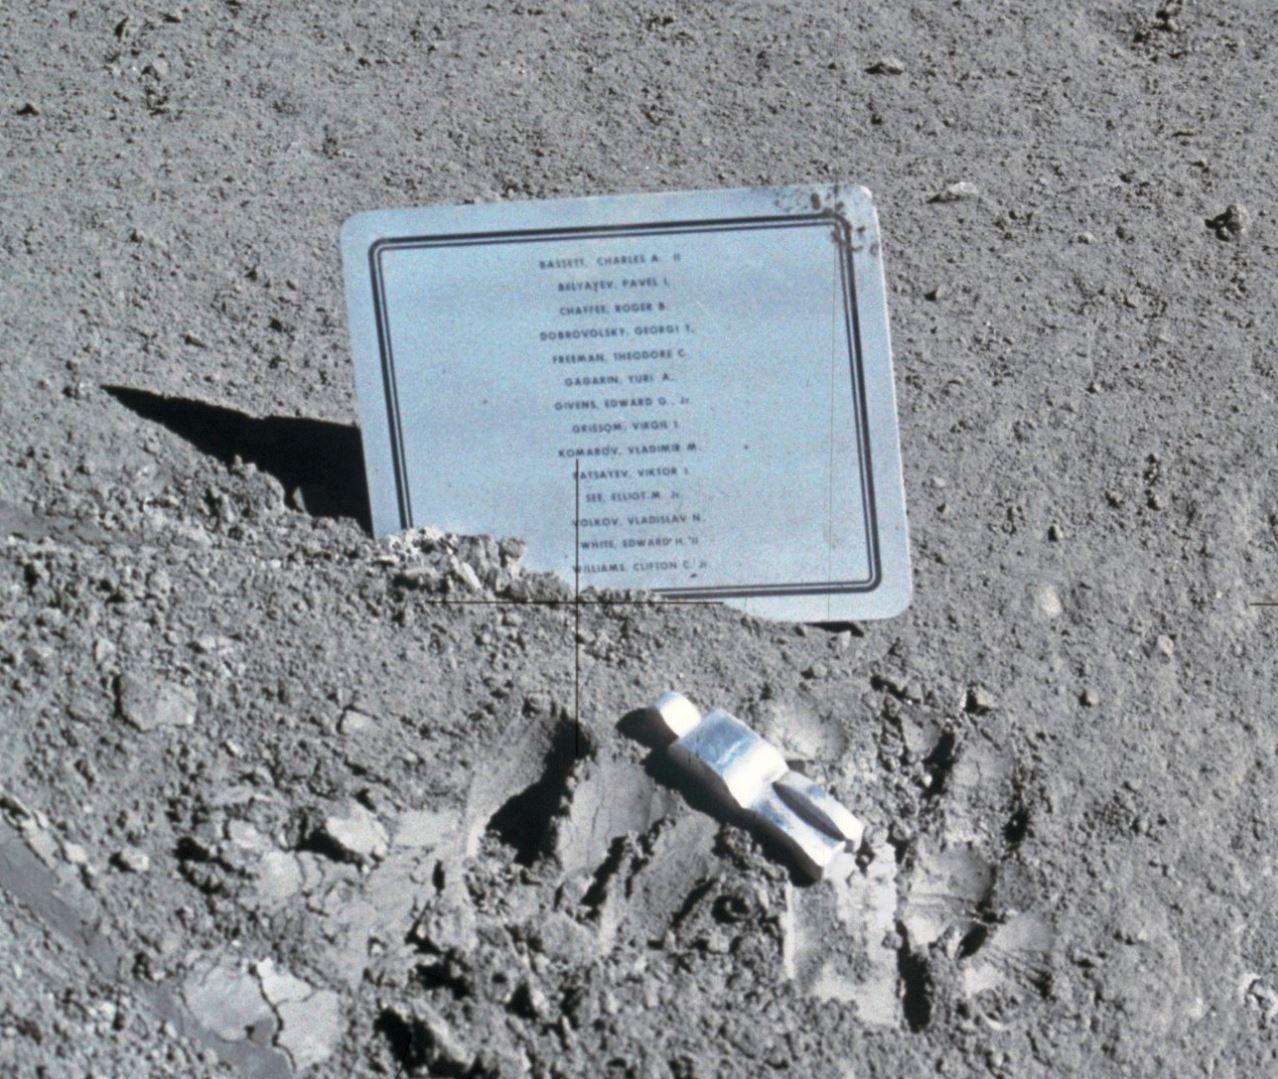 Apollo 15 astronauts David R. Scott and James B. Irwin left a commemorative plaque on the Moon in memory of 14 NASA astronauts and USSR cosmonauts. The tiny, man-like object represents the figure of a fallen astronaut/cosmonaut. - Image Credit:  NASA